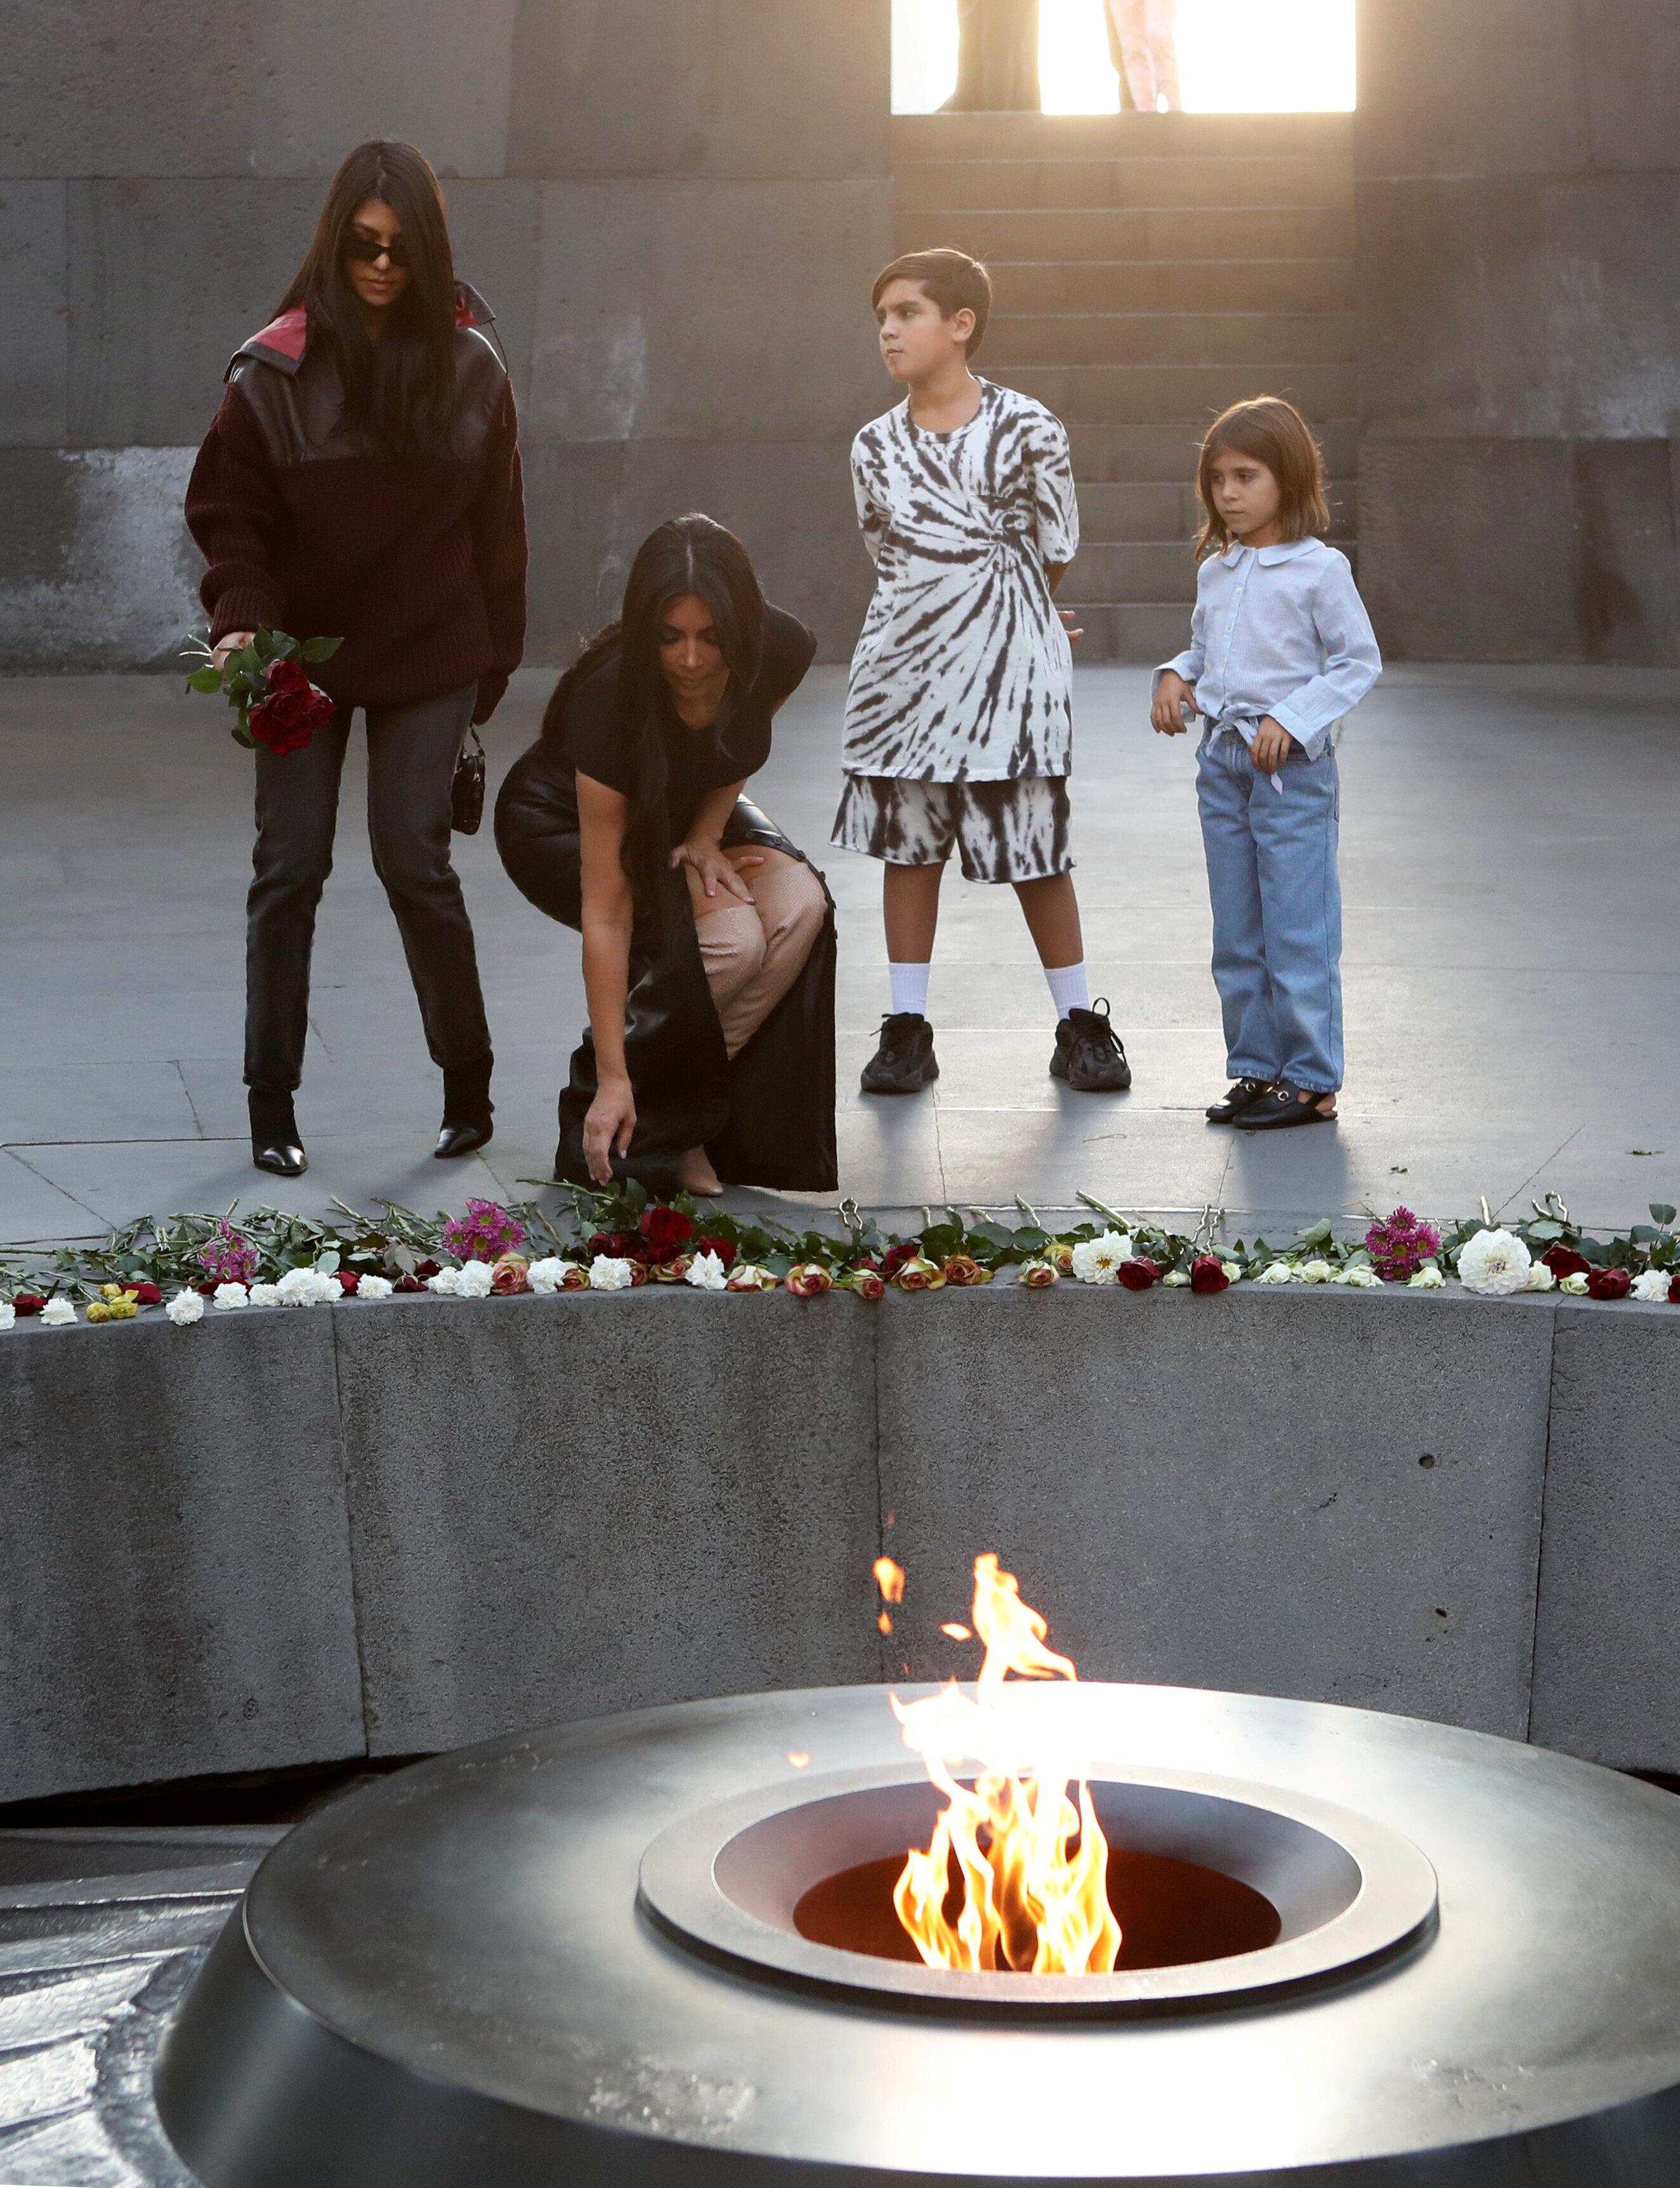 Reality TV personality Kim Kardashian and her sister Kourtney Kardashian with children visit the Armenian Genocide Memorial i